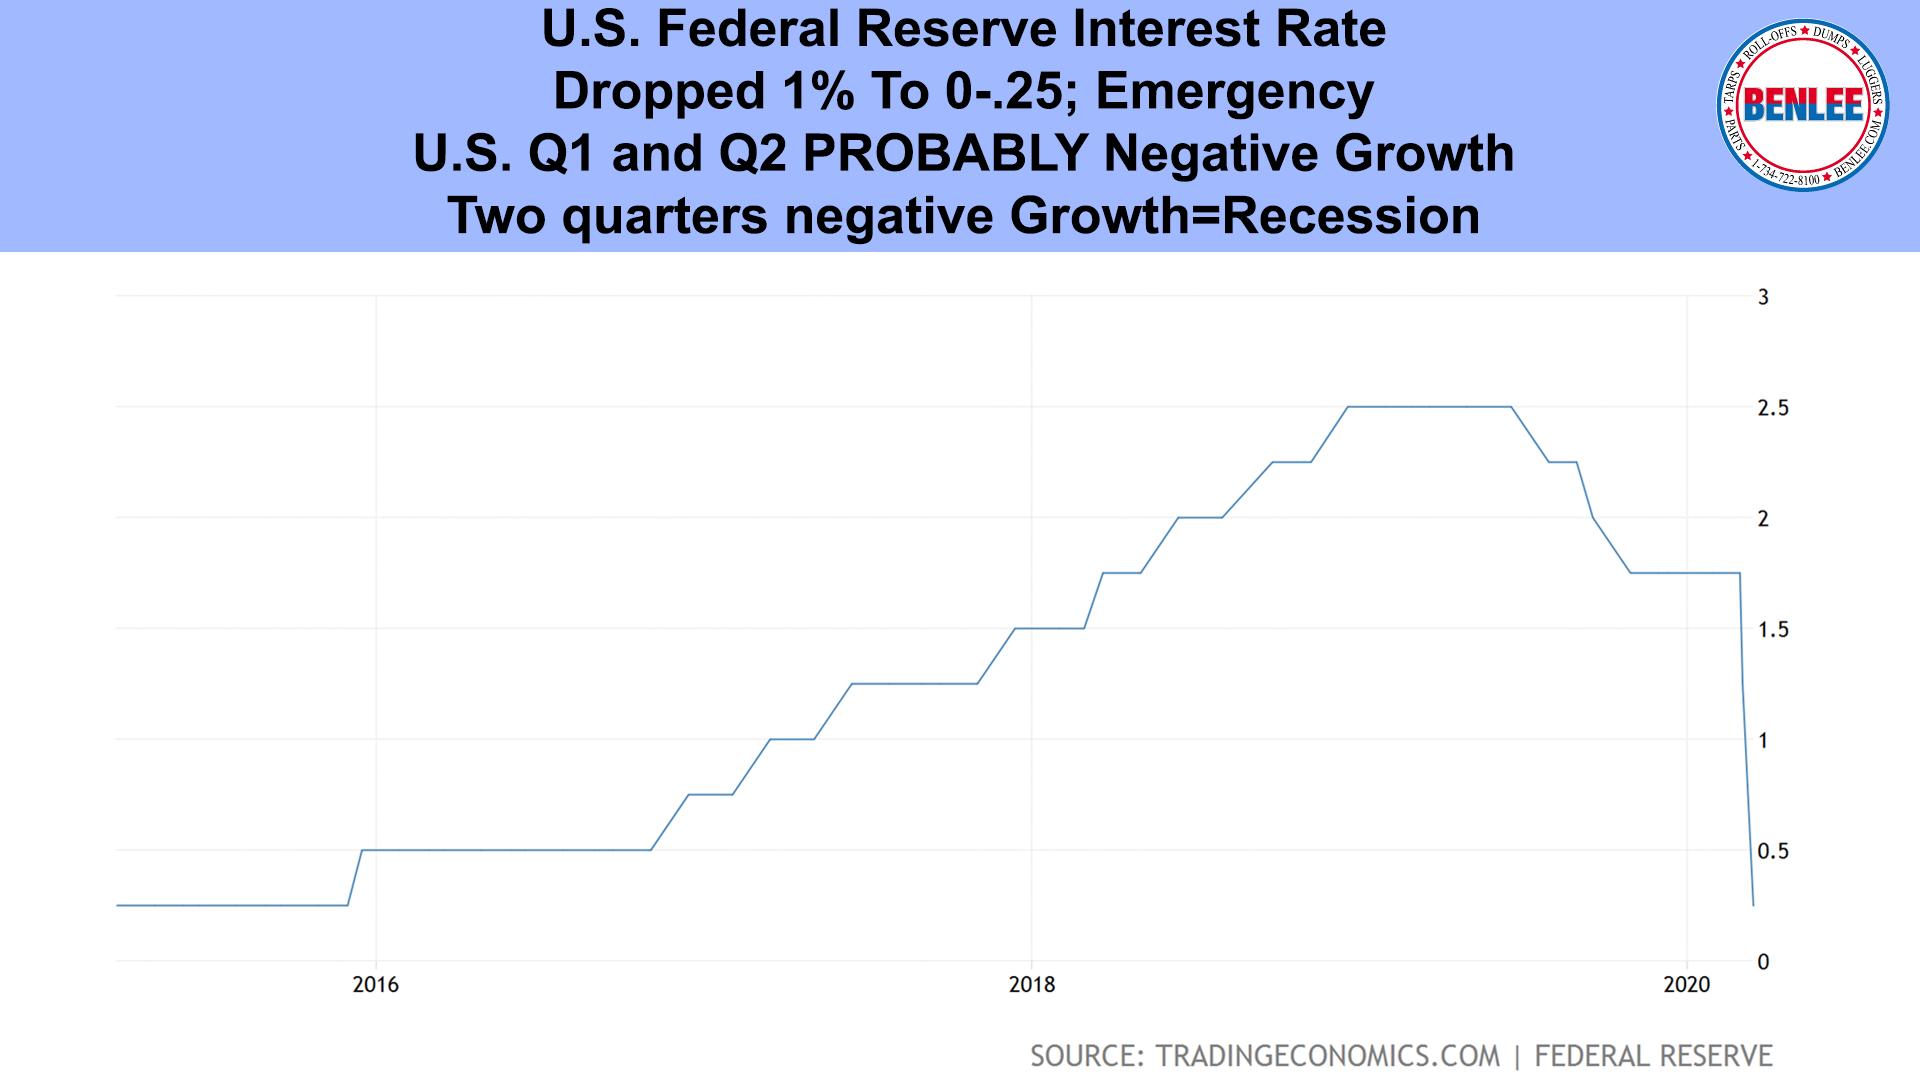 U.S. Federal Reserve Interest Rate